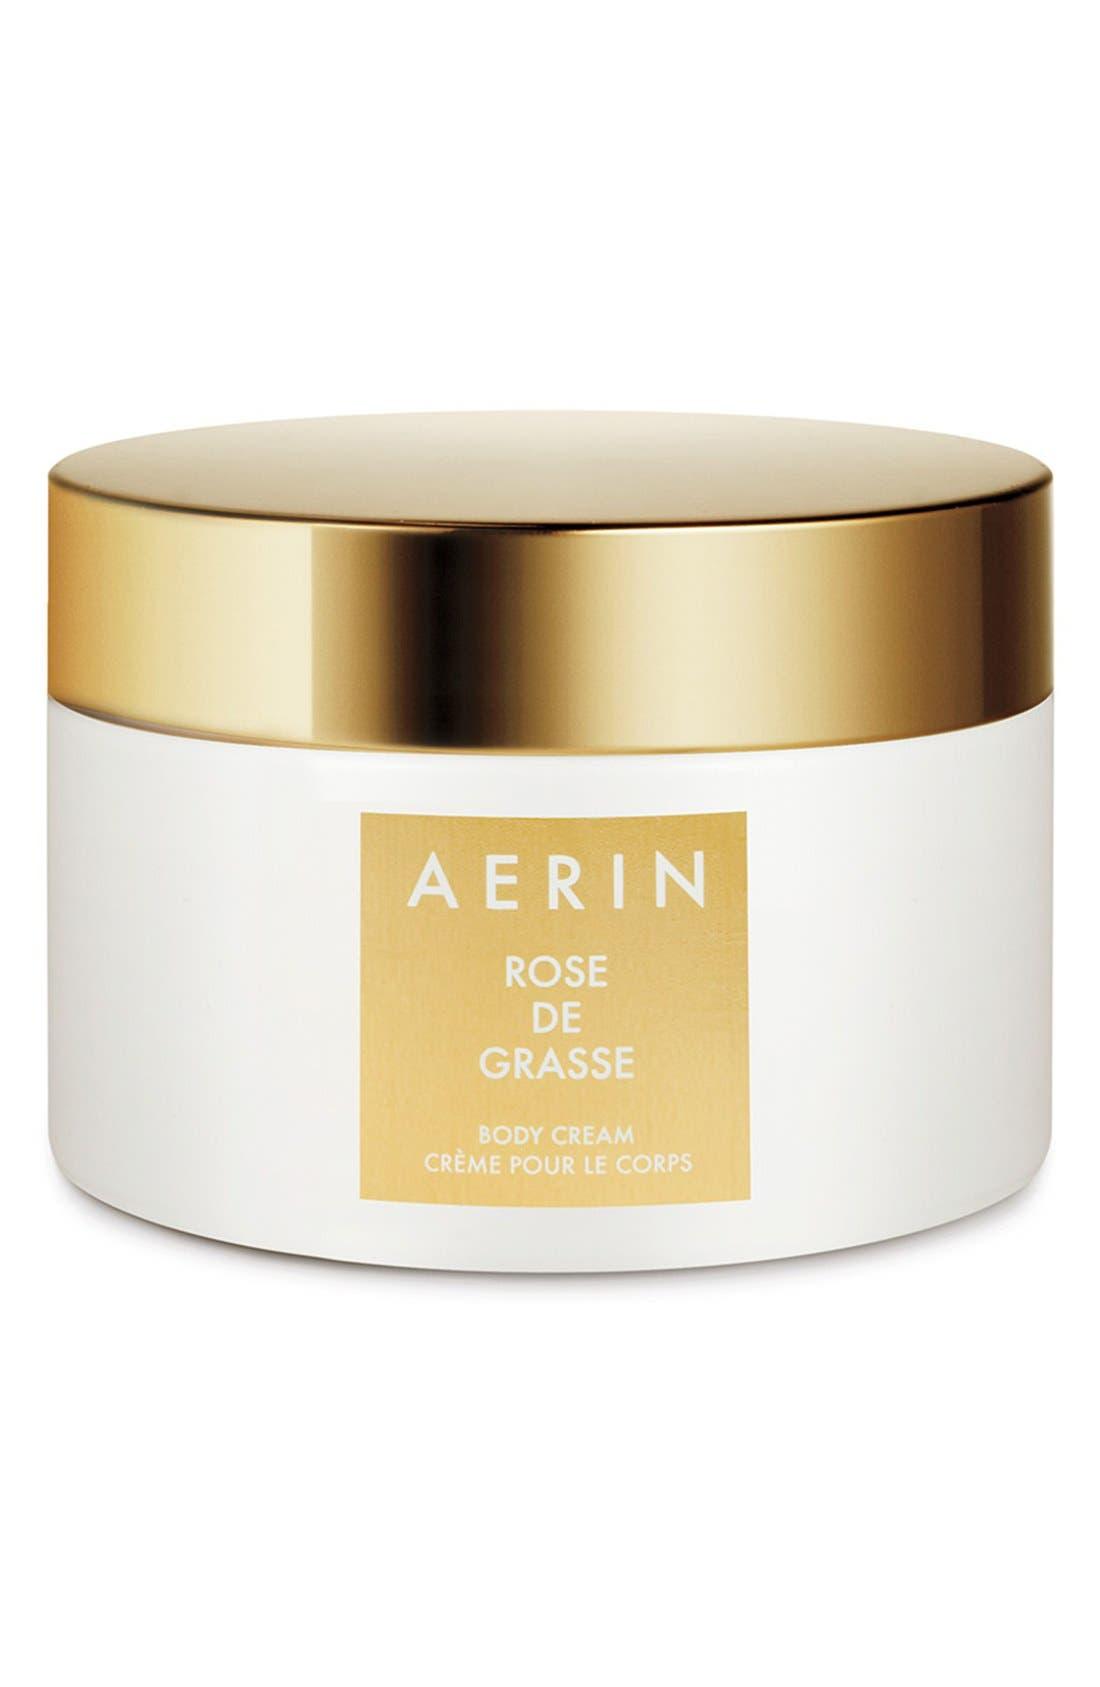 AERIN Beauty Rose de Grasse Body Cream (Limited Edition)